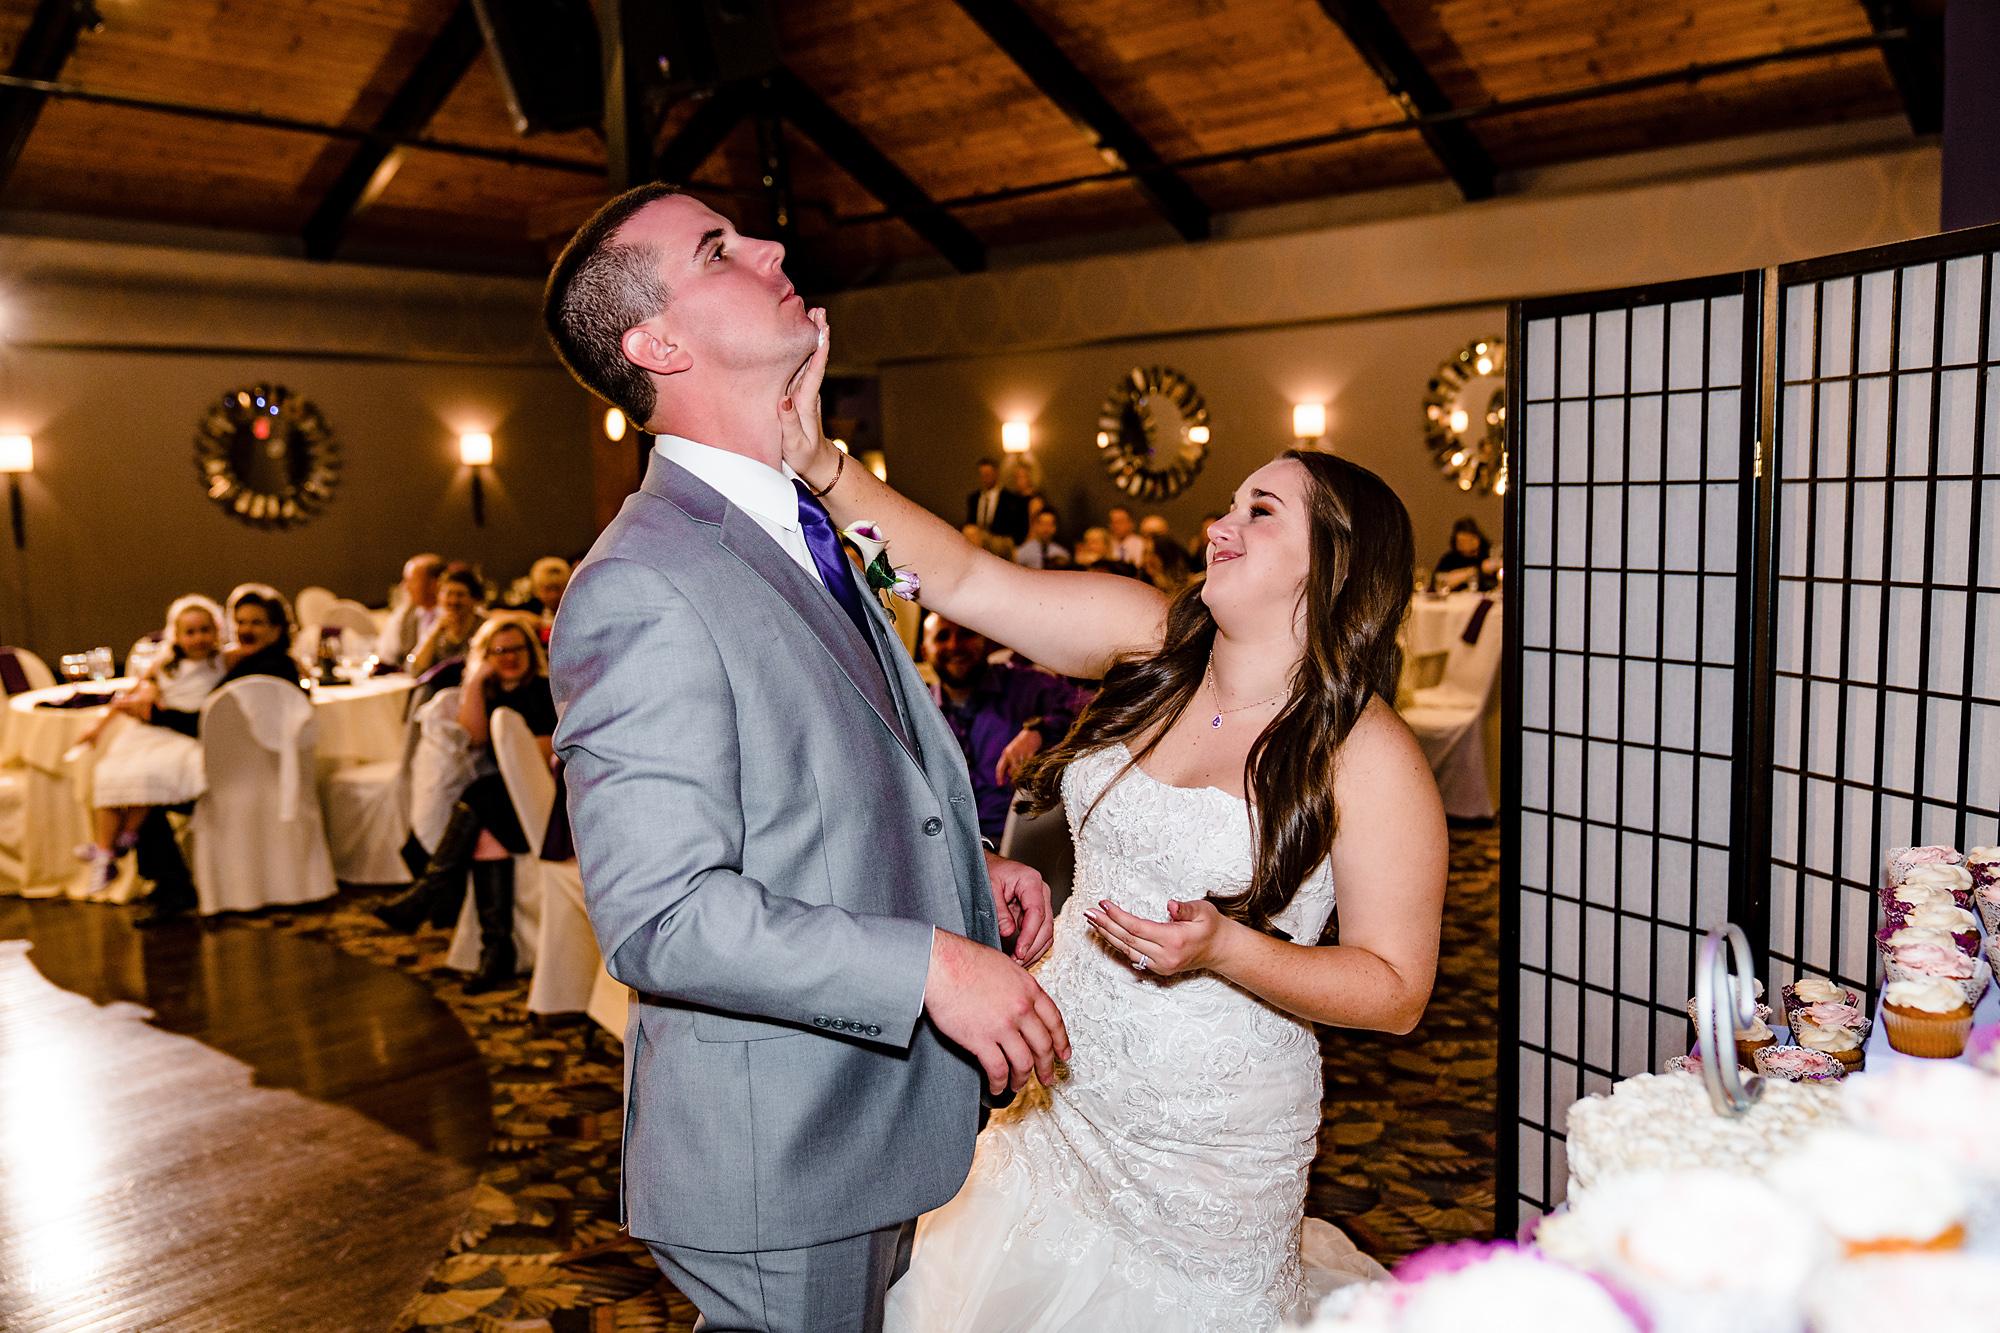 The-Pinnacle-Ballroom-Covington-KY-Wedding-Photography-16.jpg